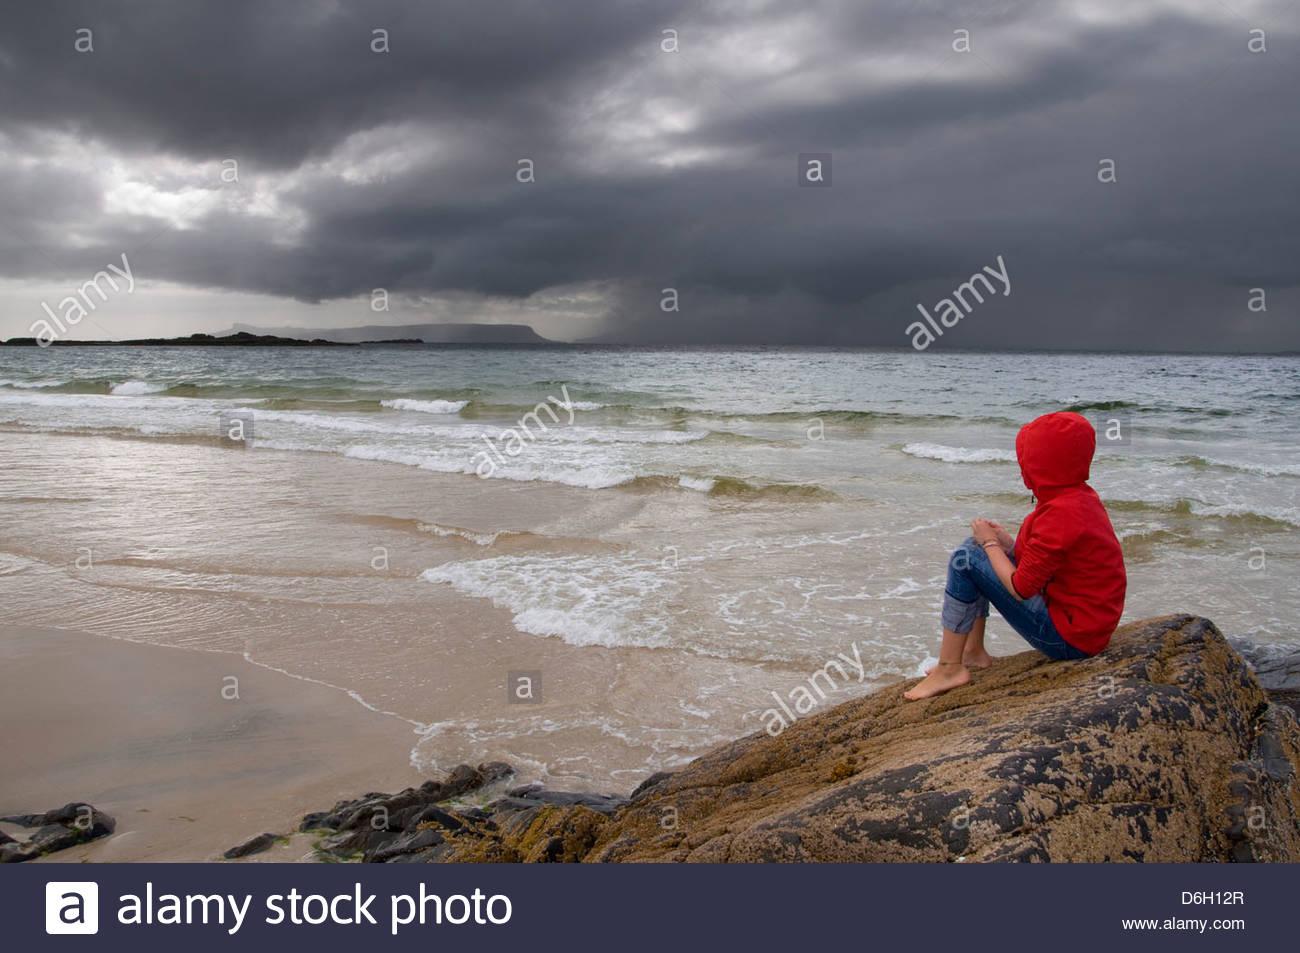 Girl sitting rock Morar Inverness-shire Scotland UK - Stock Image